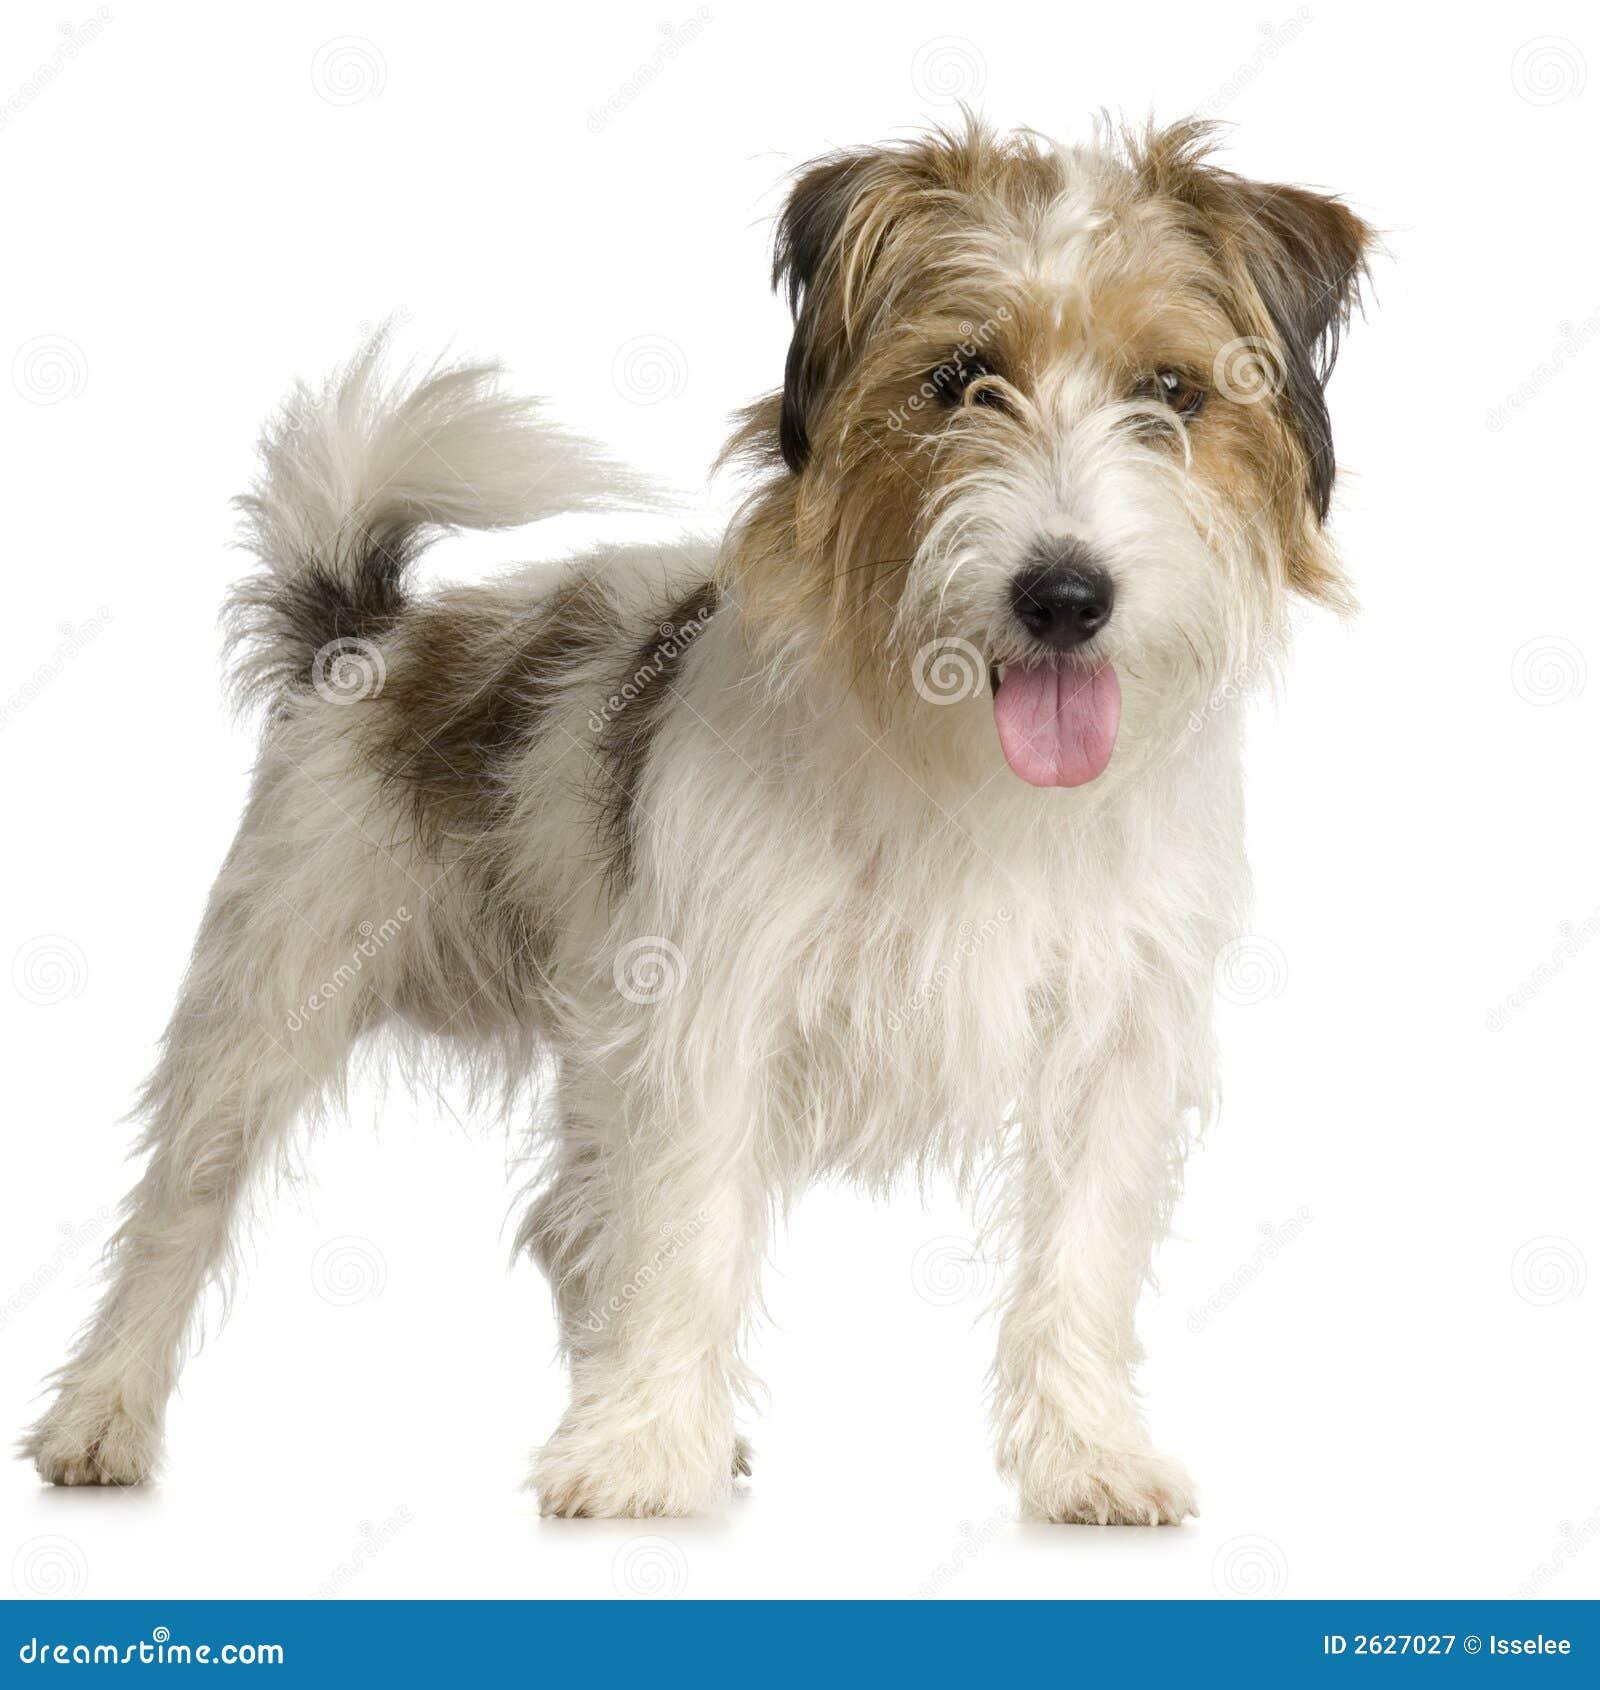 Best Dog Collar For Long Hair